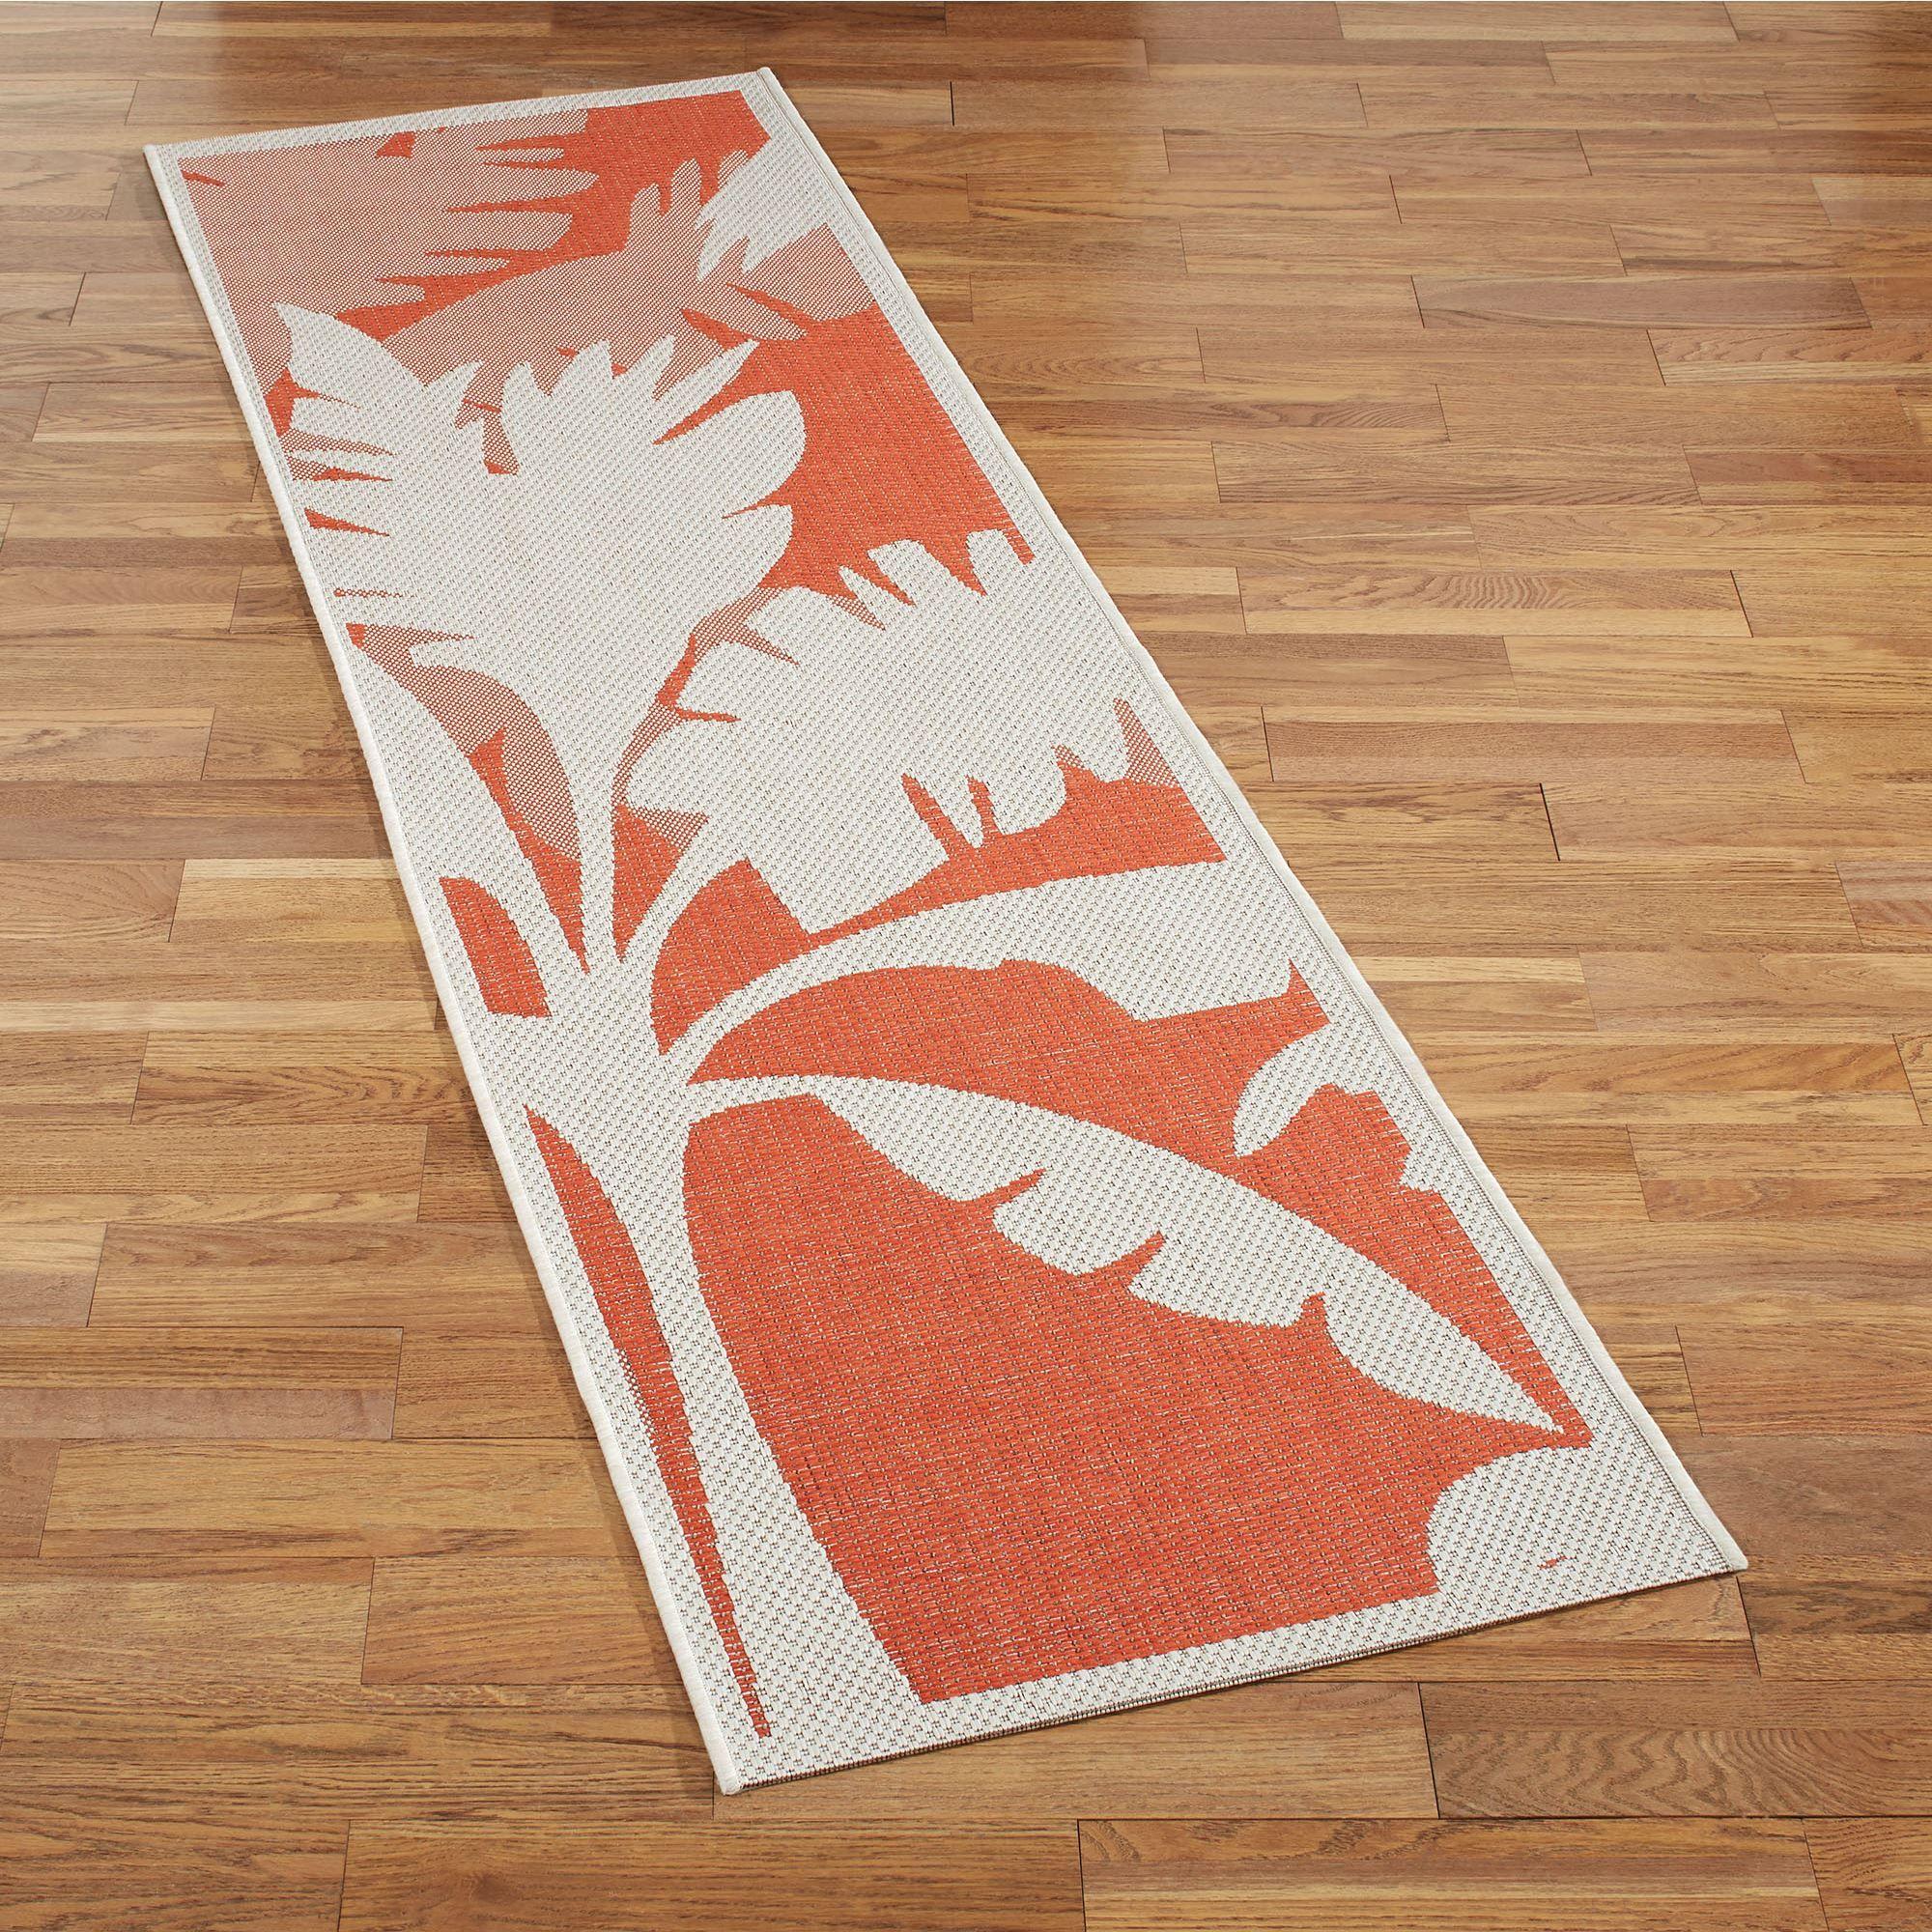 Koa Coral Tropical Palm Tree Indoor Outdoor Rug Runner